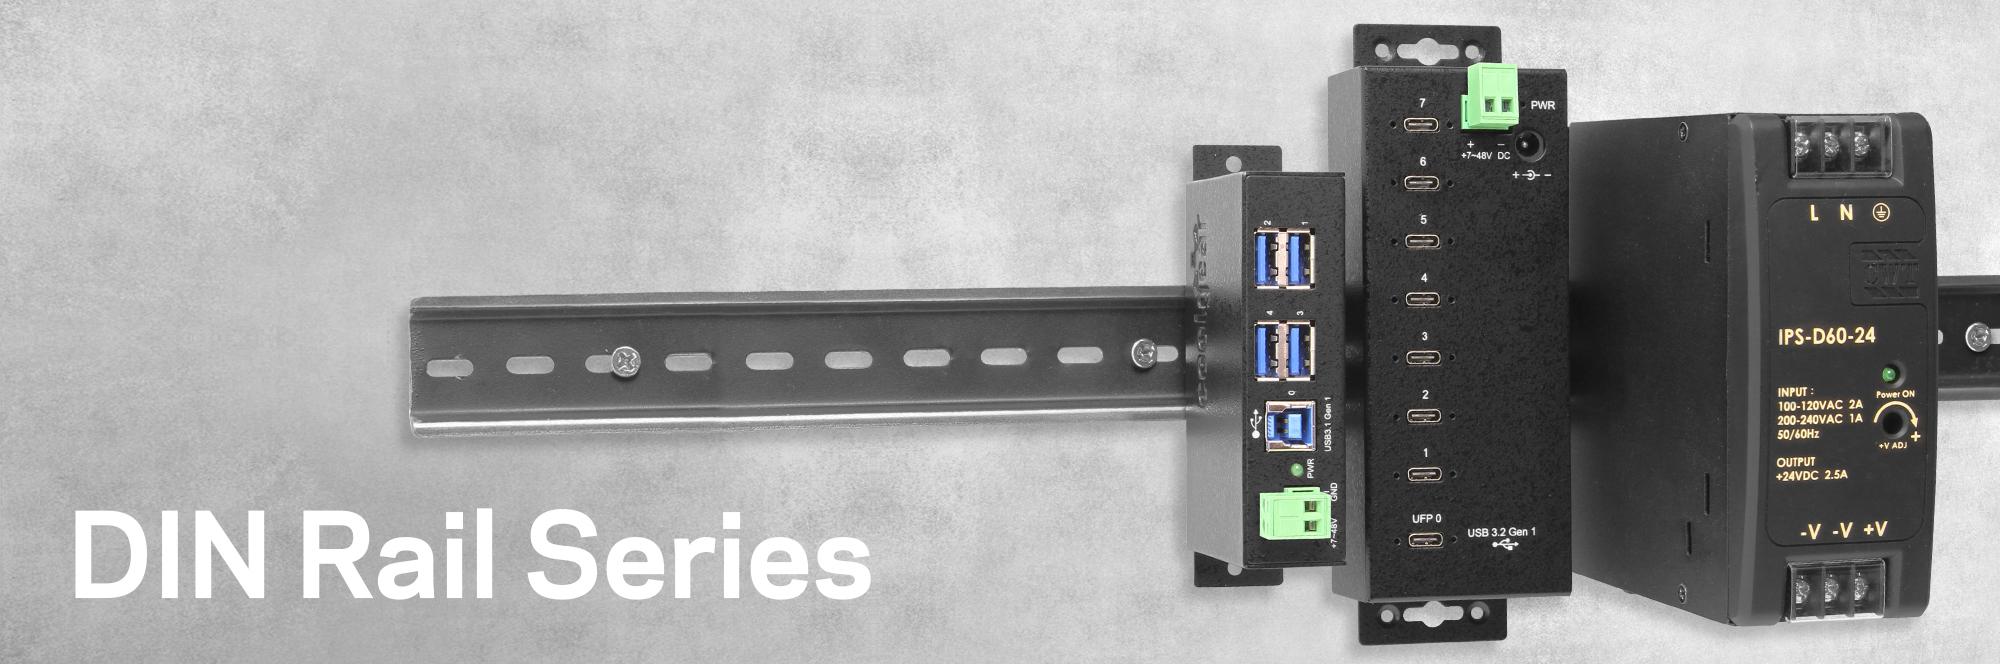 Industrial 4-Port USB 2.0 Powered Hub for PC-MAC DIN-RAIL Mount